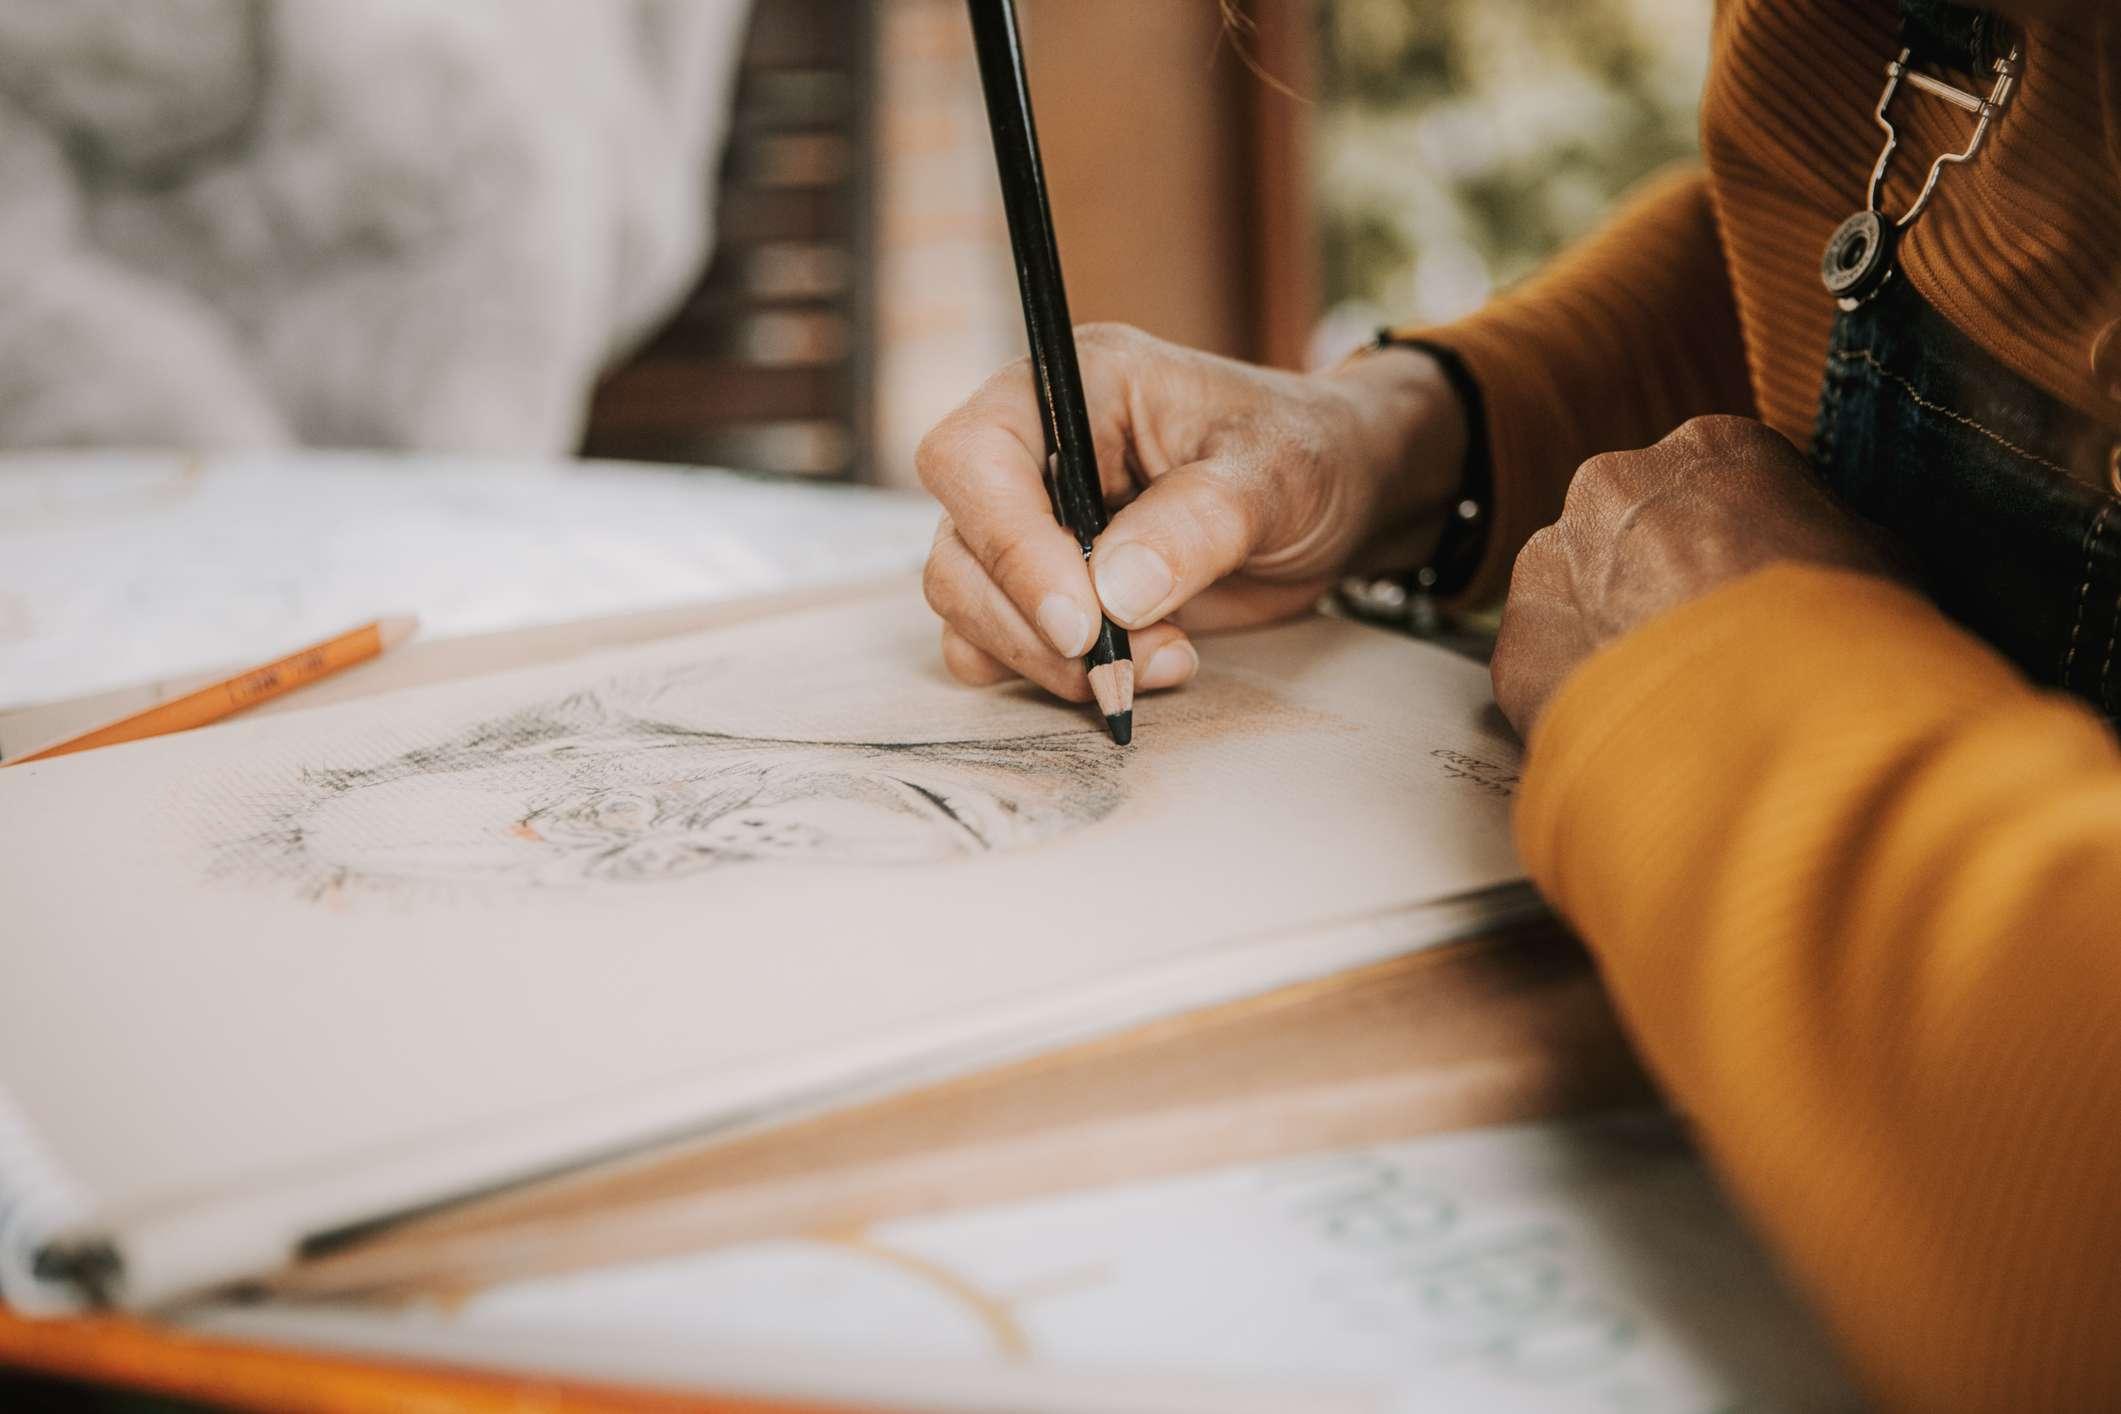 Hands sketching in notepad